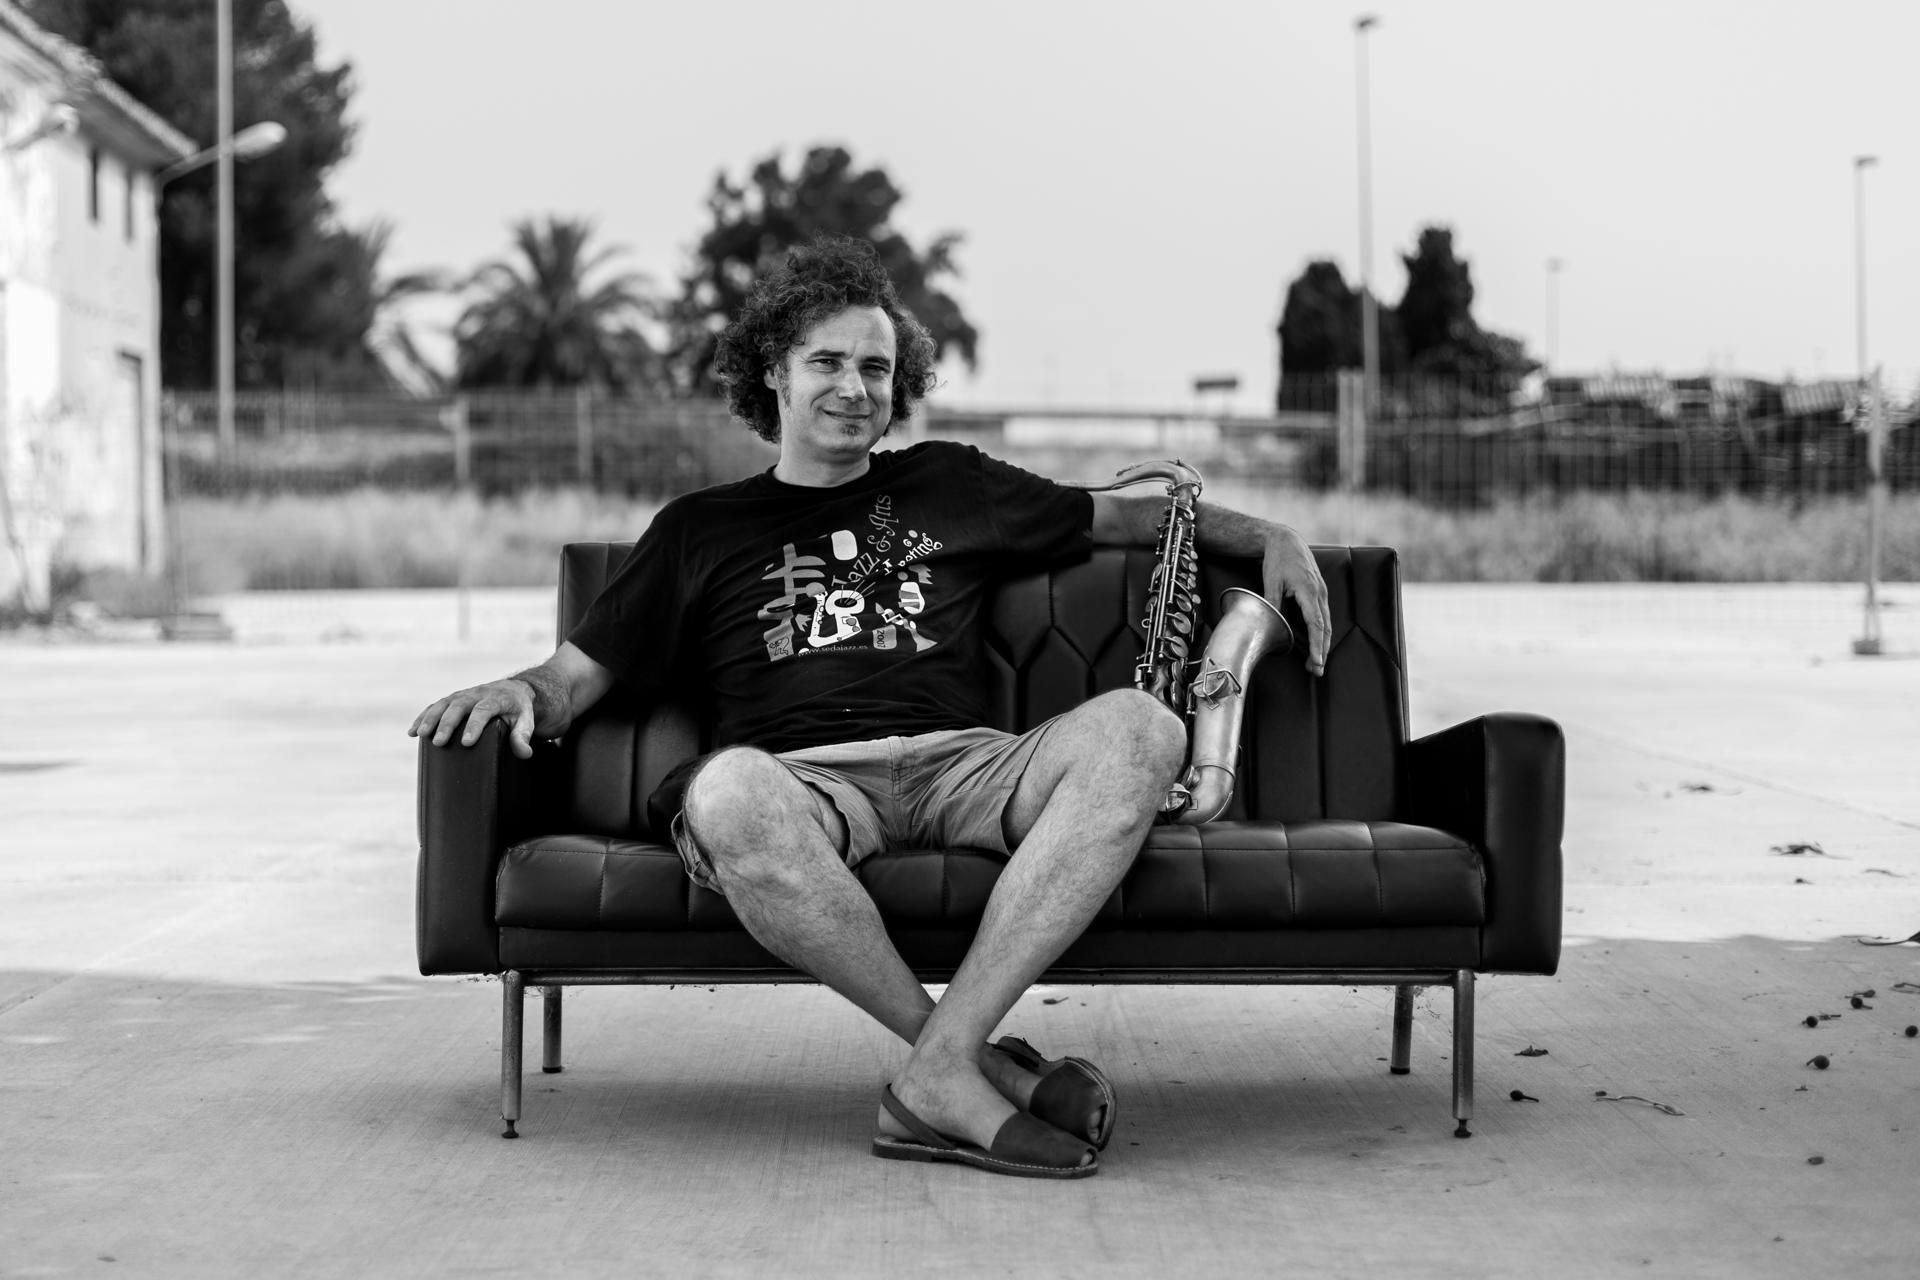 Francisco Latino Blanco da clases magistrales en Canarias